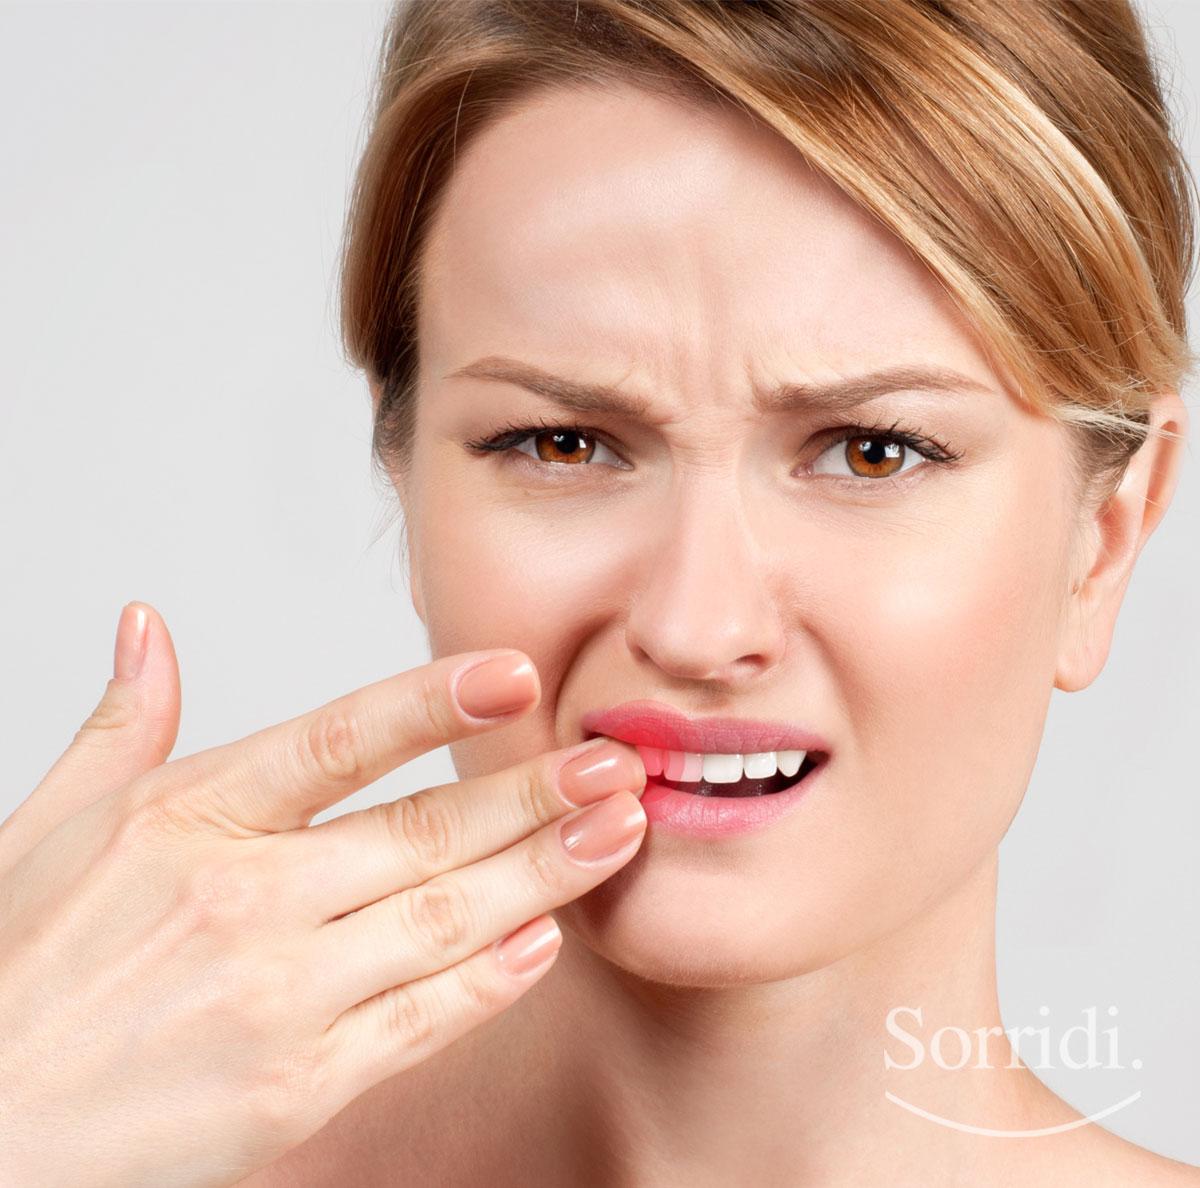 Sorridi-ch-magazine-traumi-ai-denti